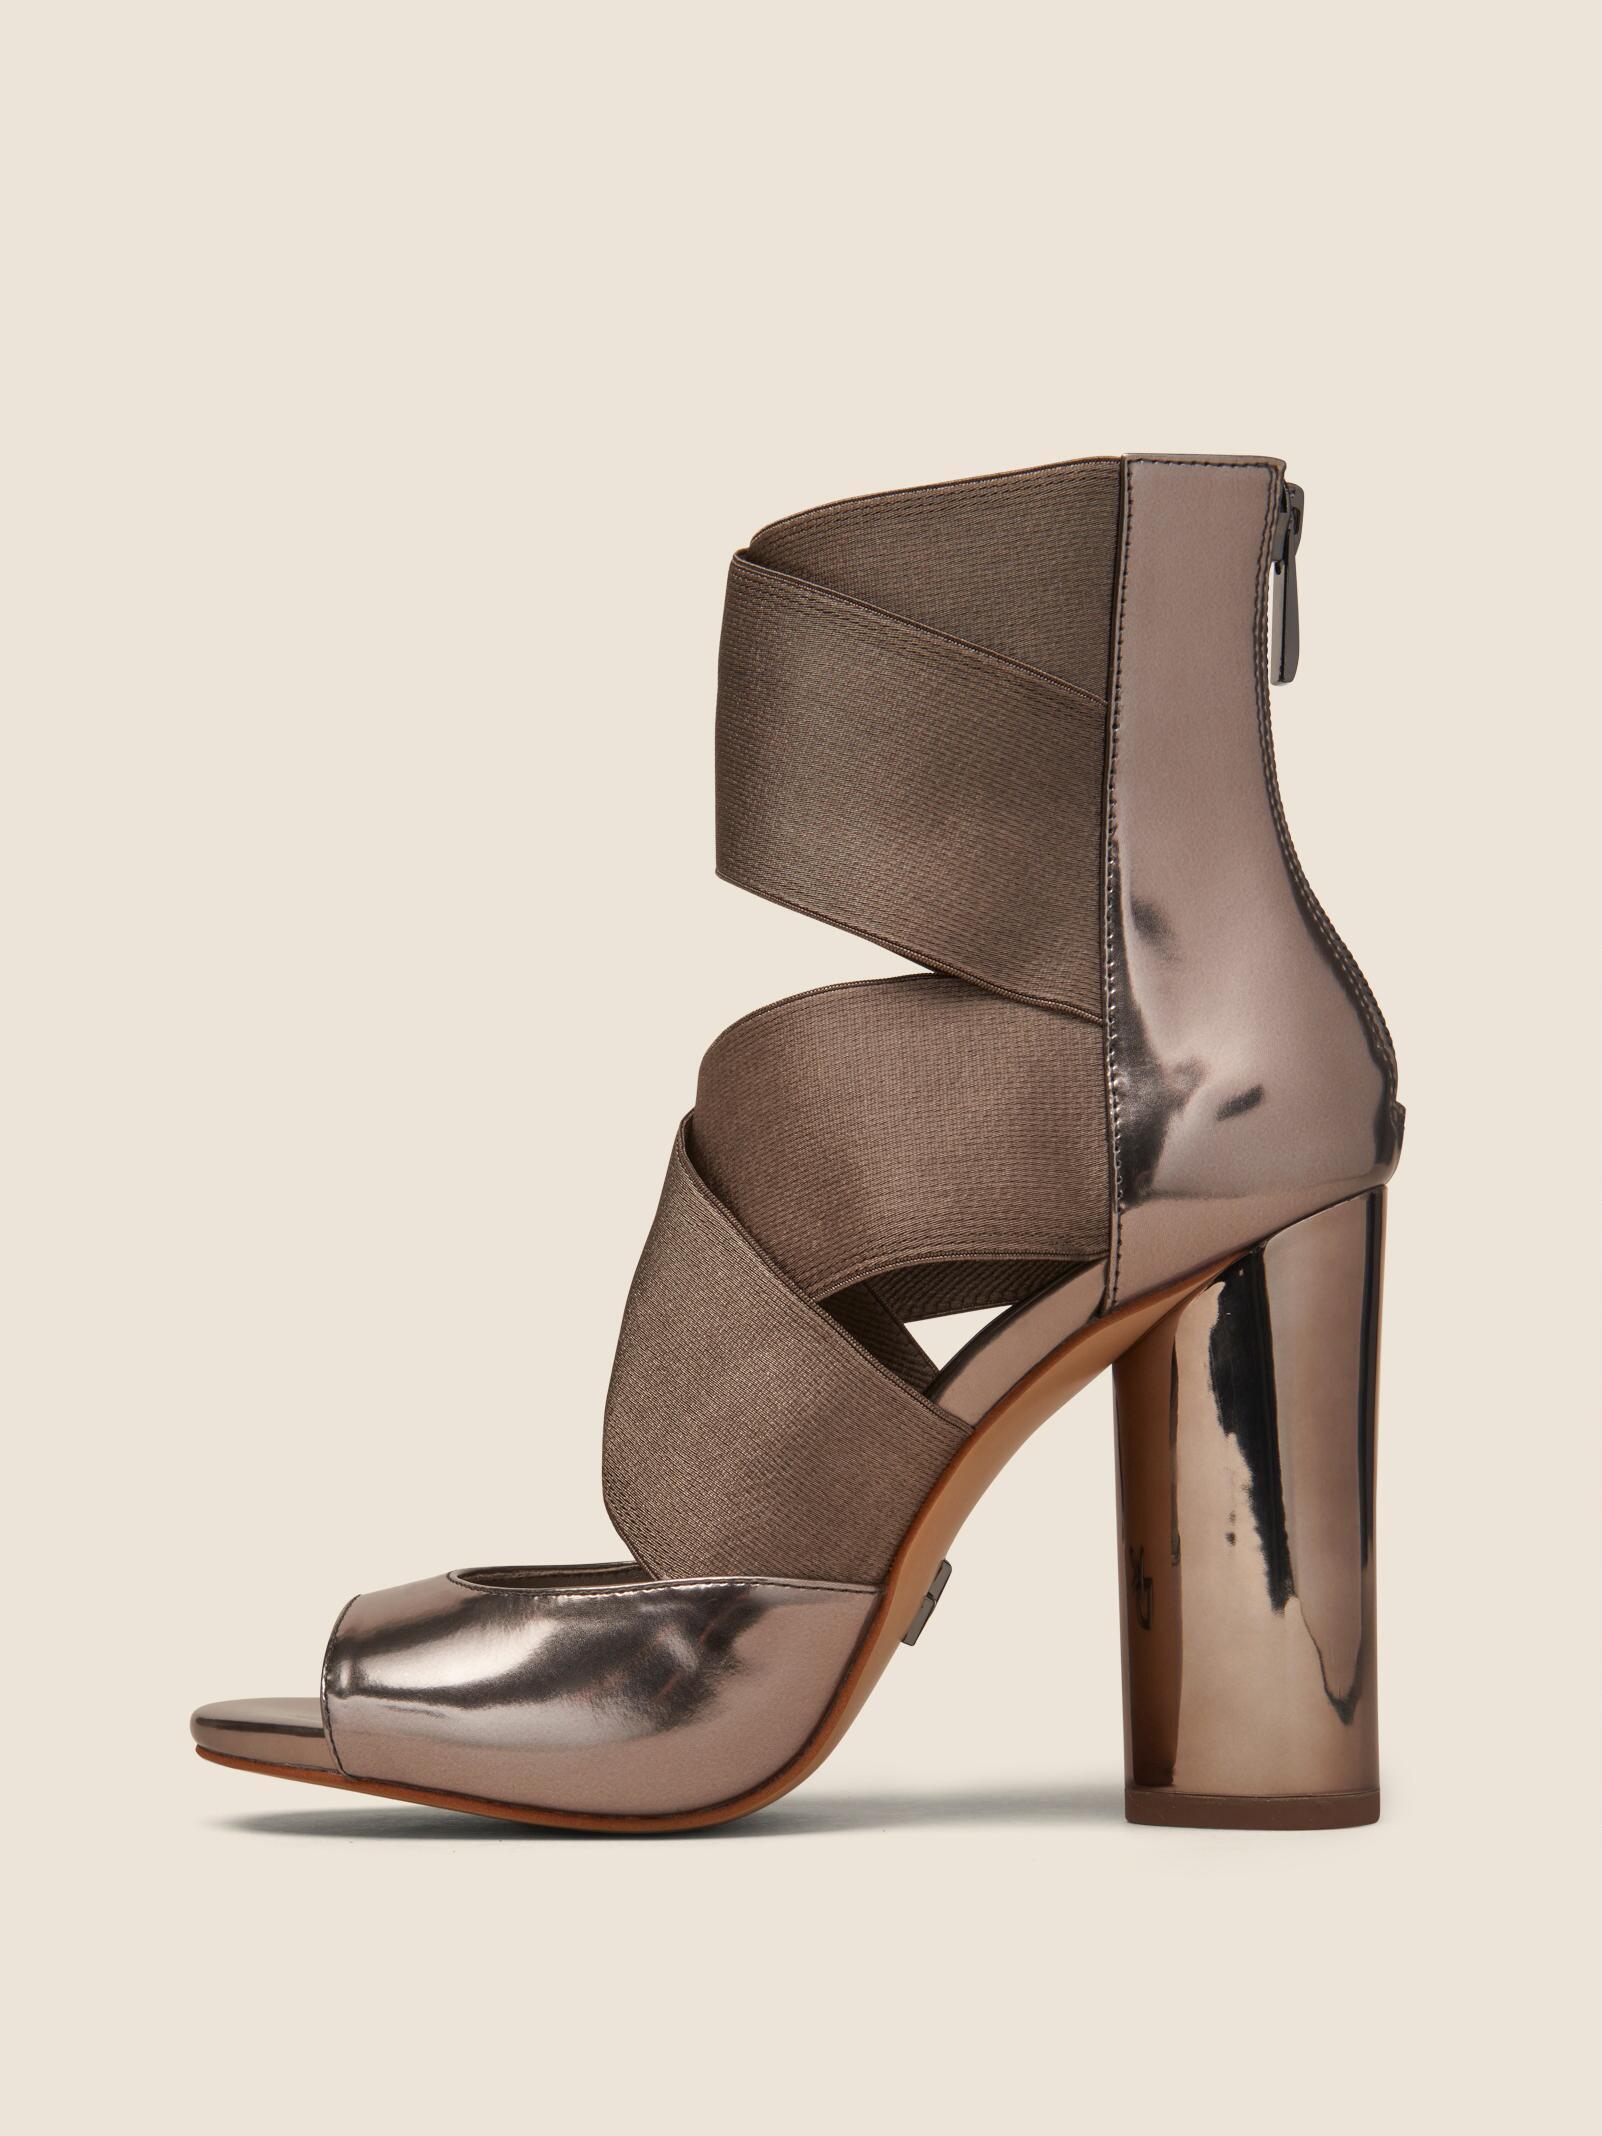 2f517c785da Lyst - DKNY Briana Multi-strap Heeled Leather Sandal in Brown